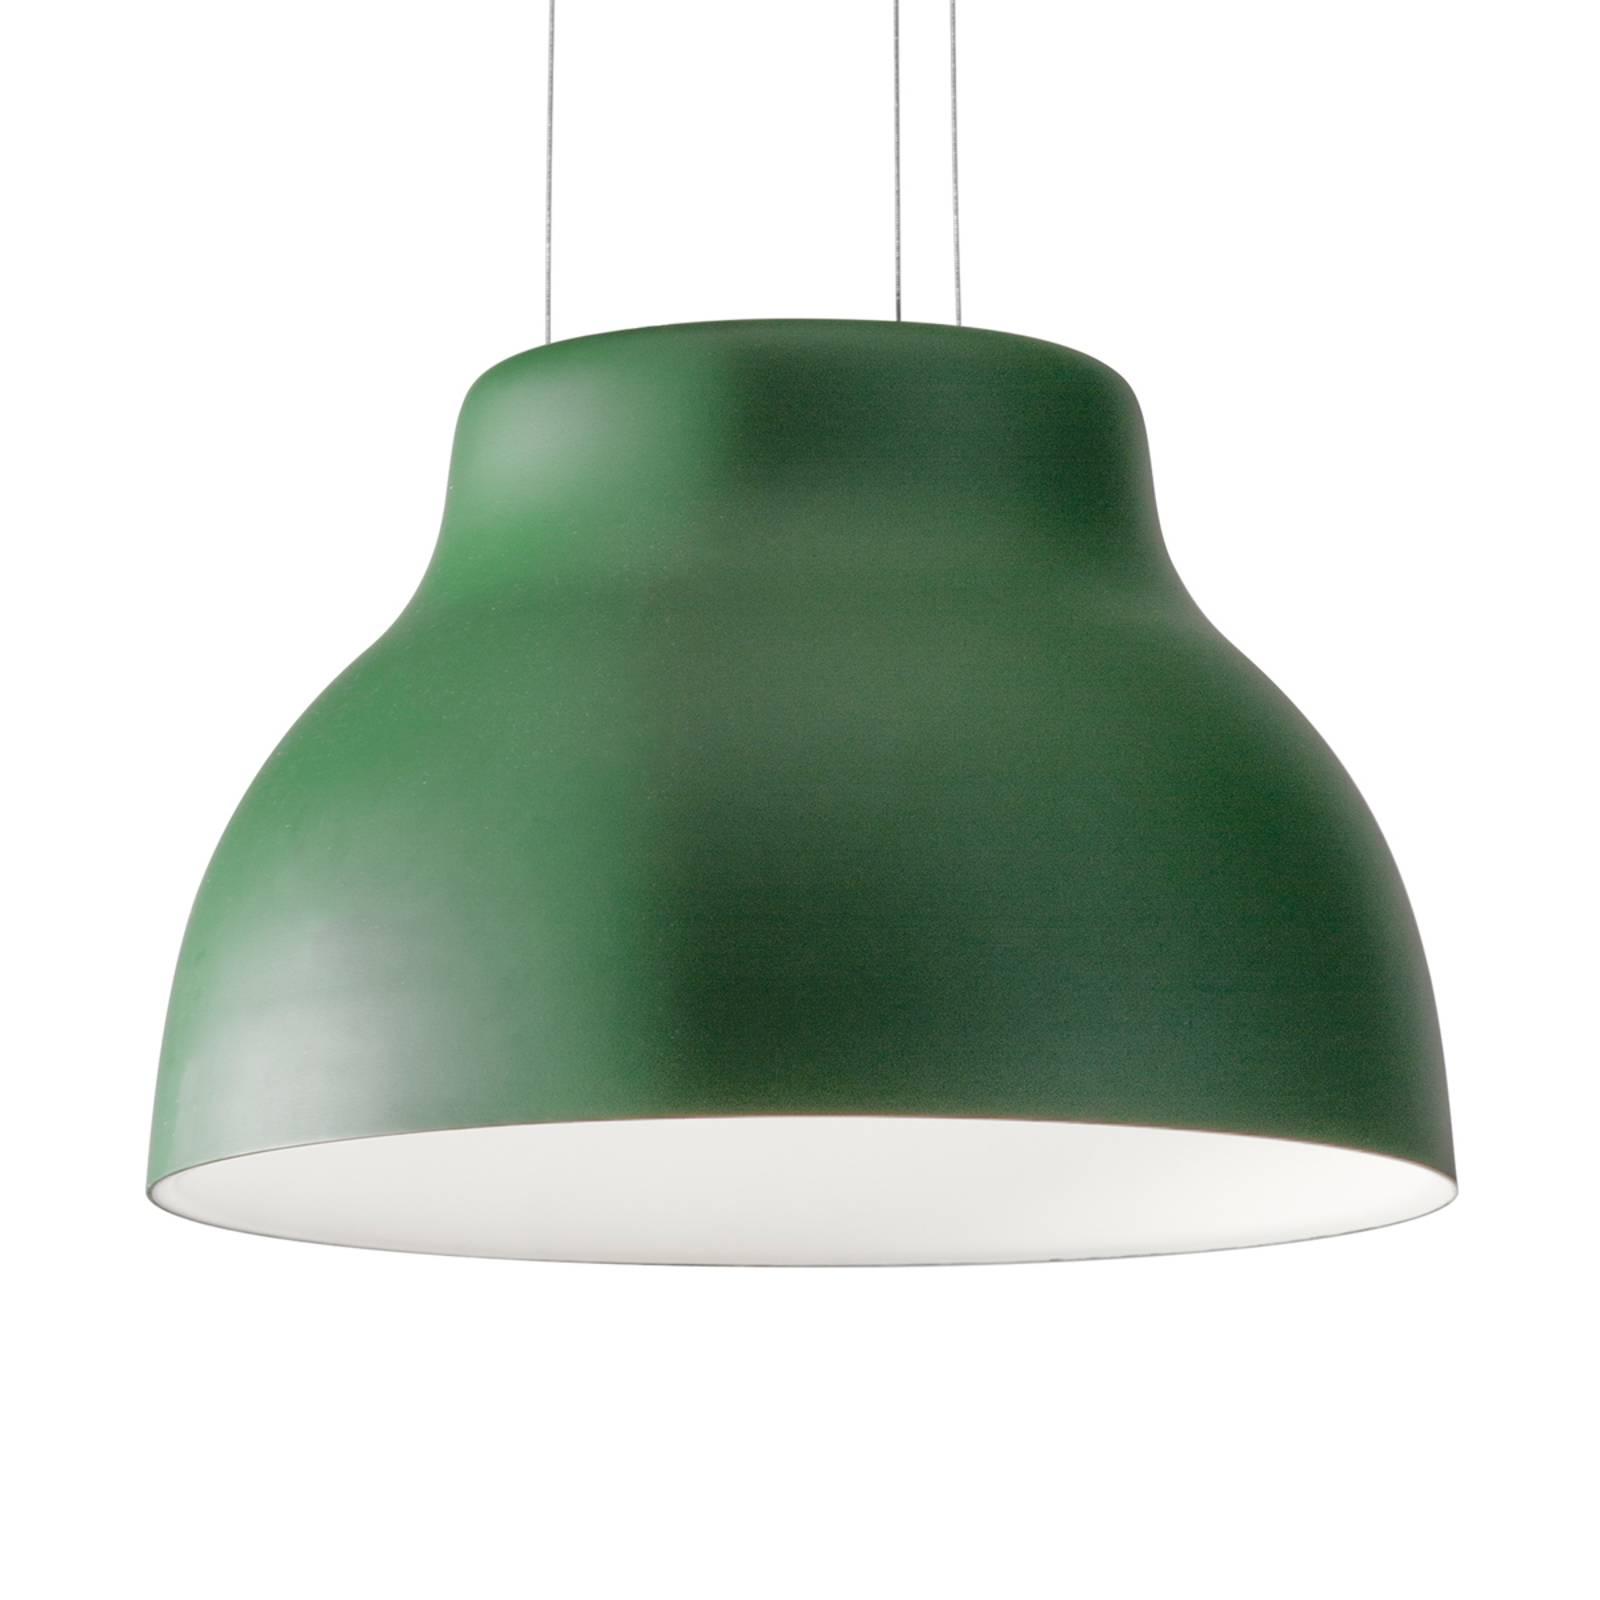 Martinelli Luce Cicala - LED hanglamp, groen